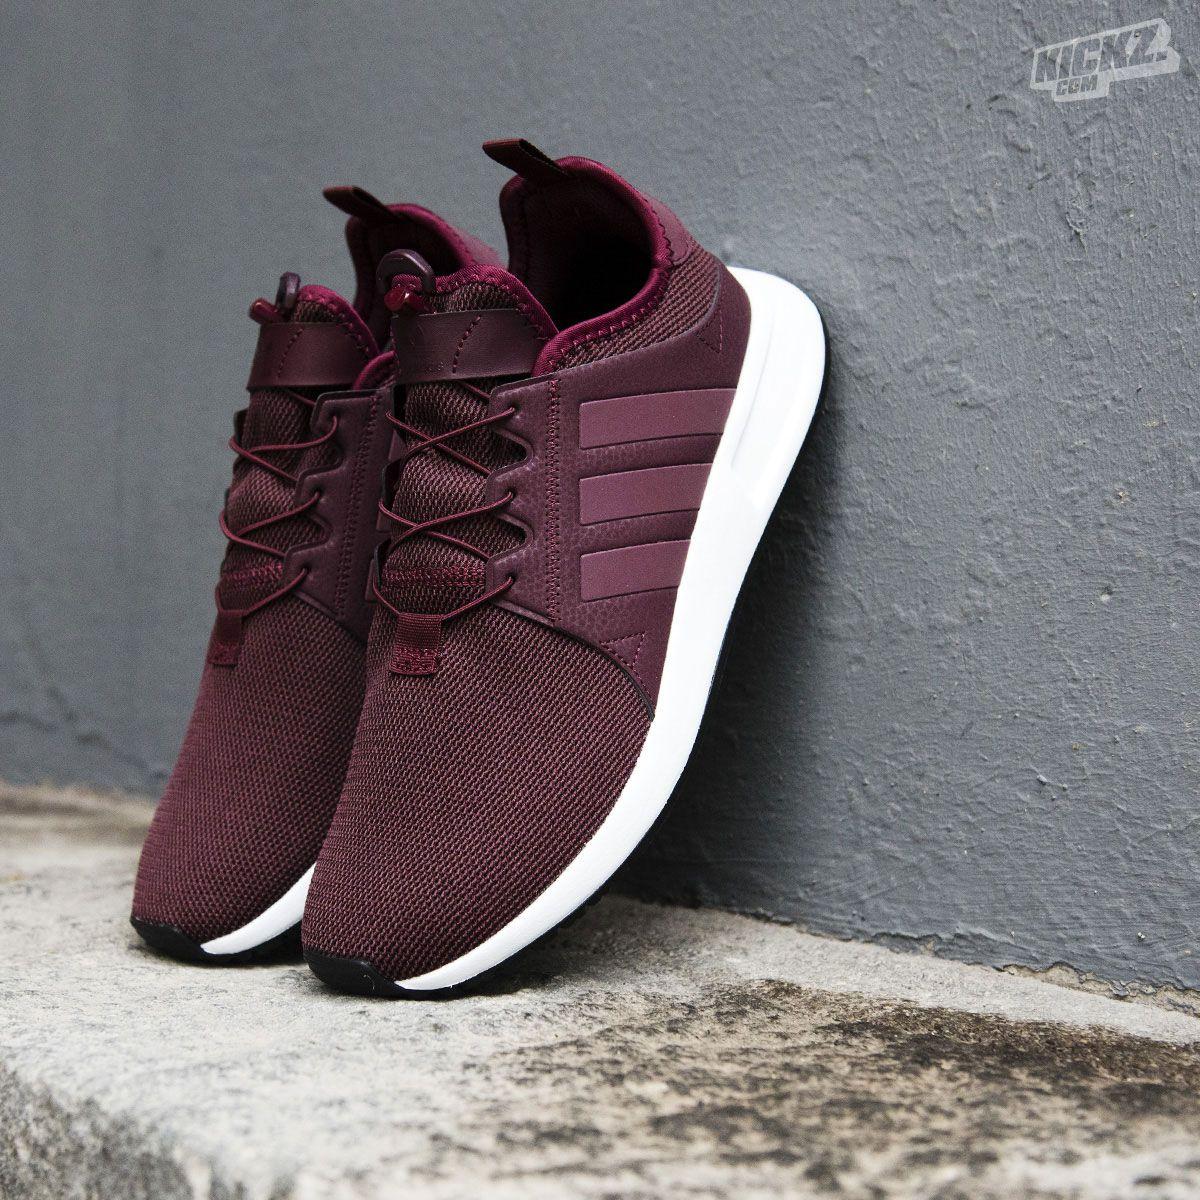 The Adidas X_PLR (maroon) is a thing of beauty. @ kickz.com